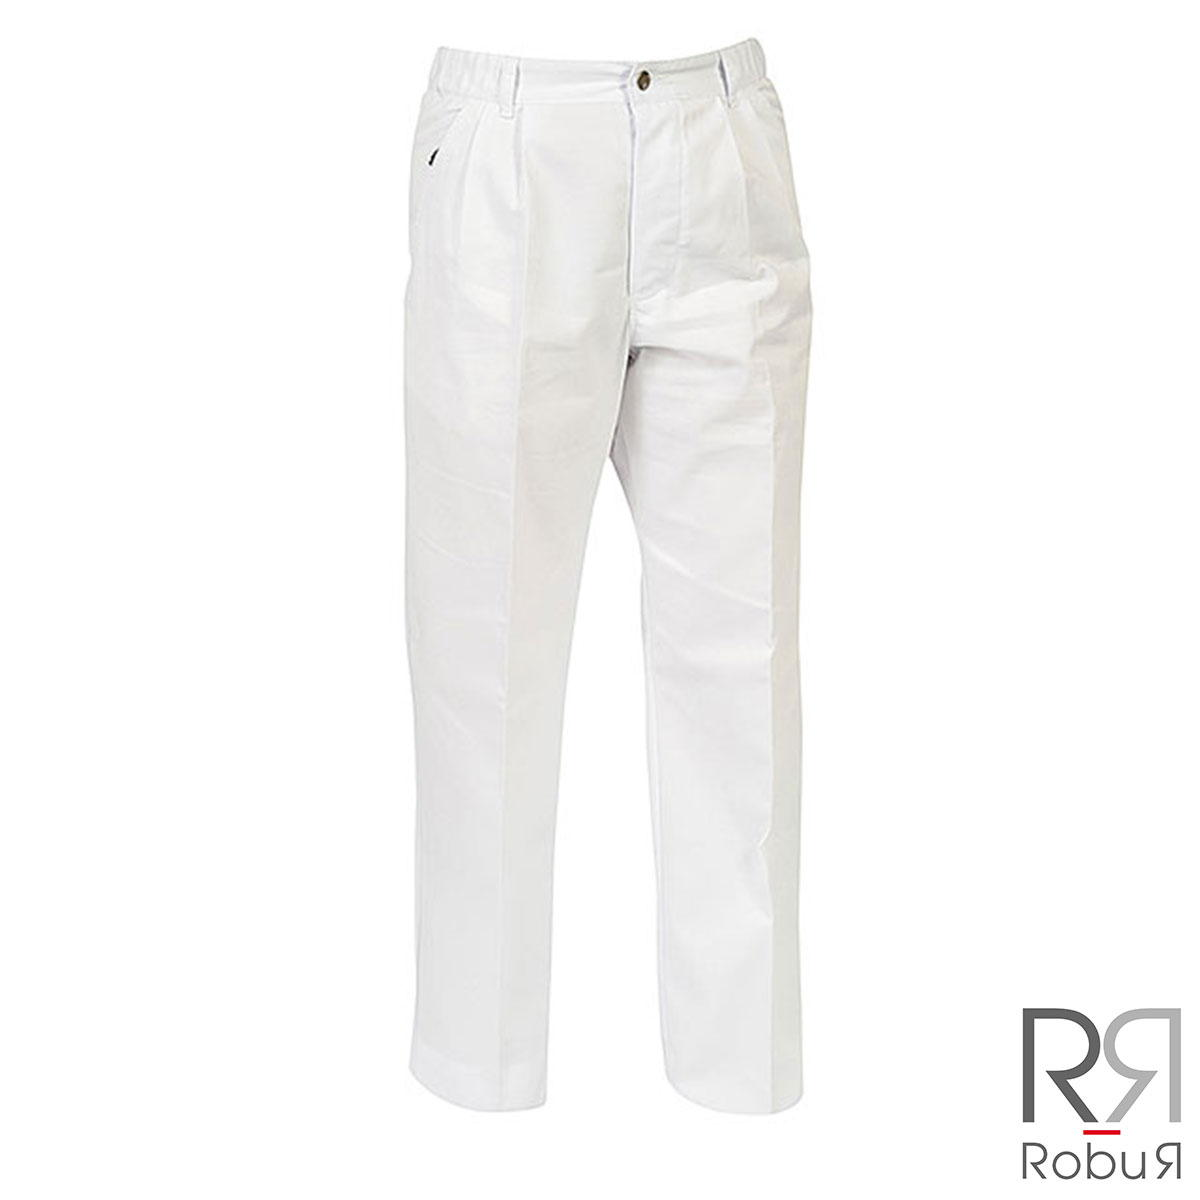 pantalon mistral pour homme standard textile. Black Bedroom Furniture Sets. Home Design Ideas